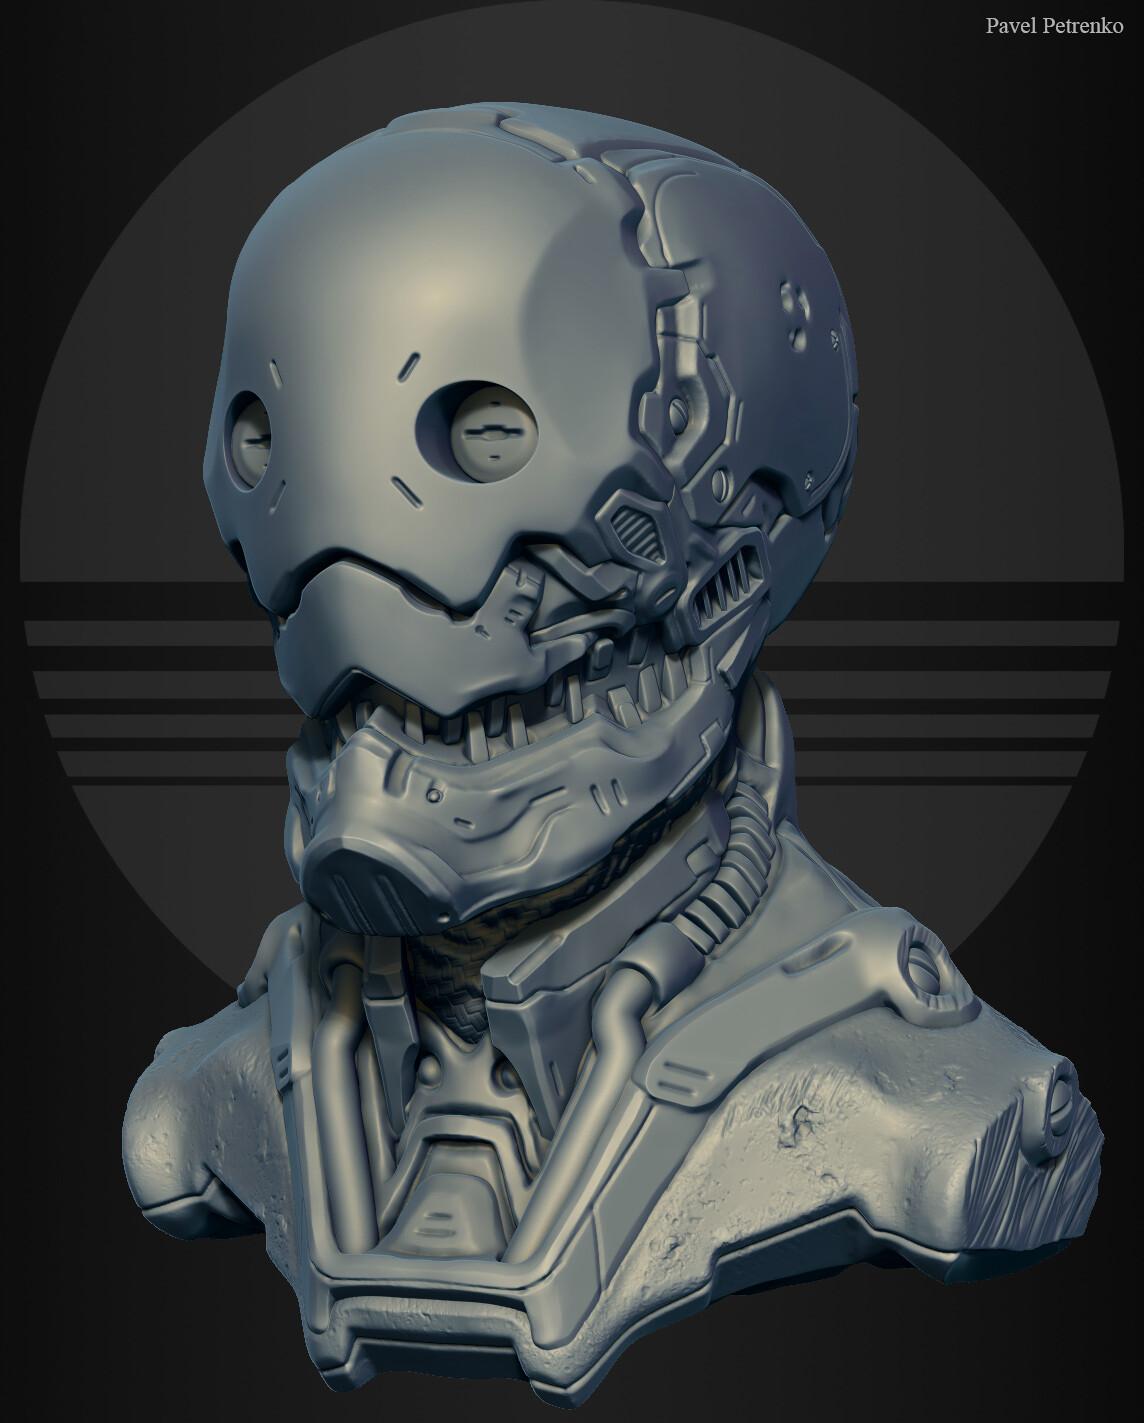 Pavel petrenko cyborg2